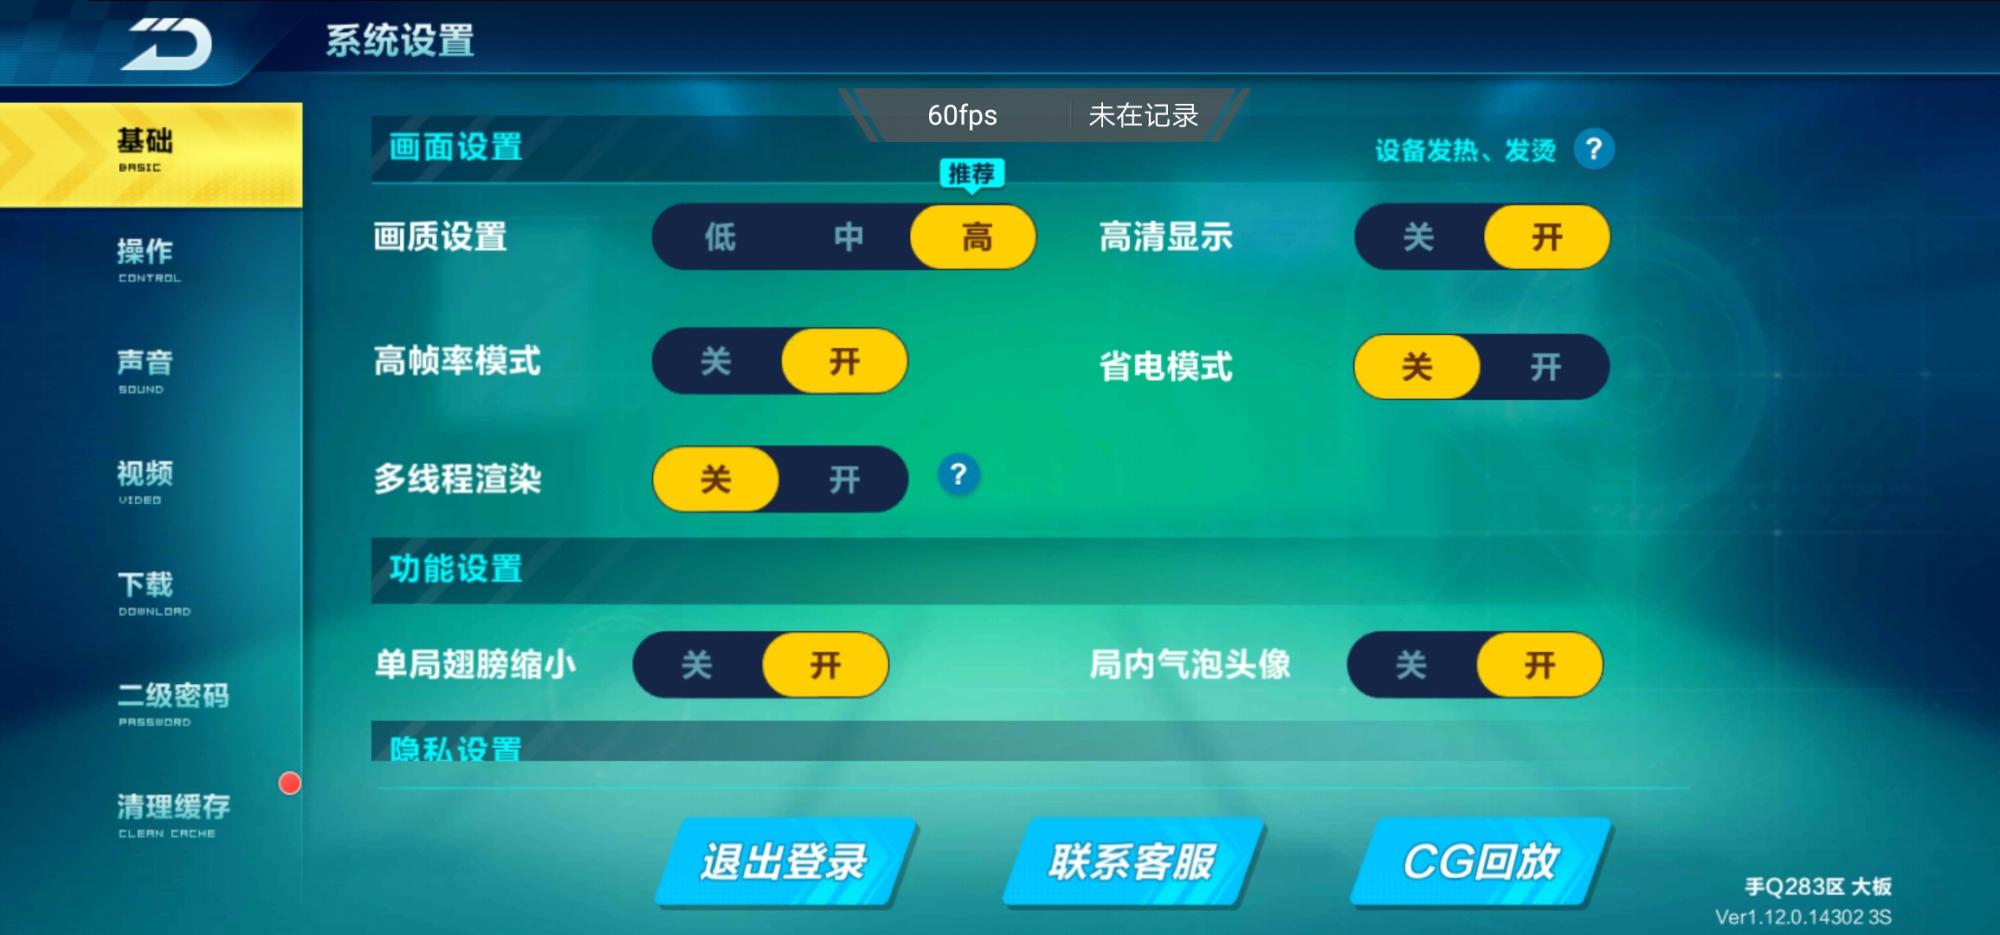 Screenshot_20190506_224938_com.tencent.tmgp.speedmobile.jpg